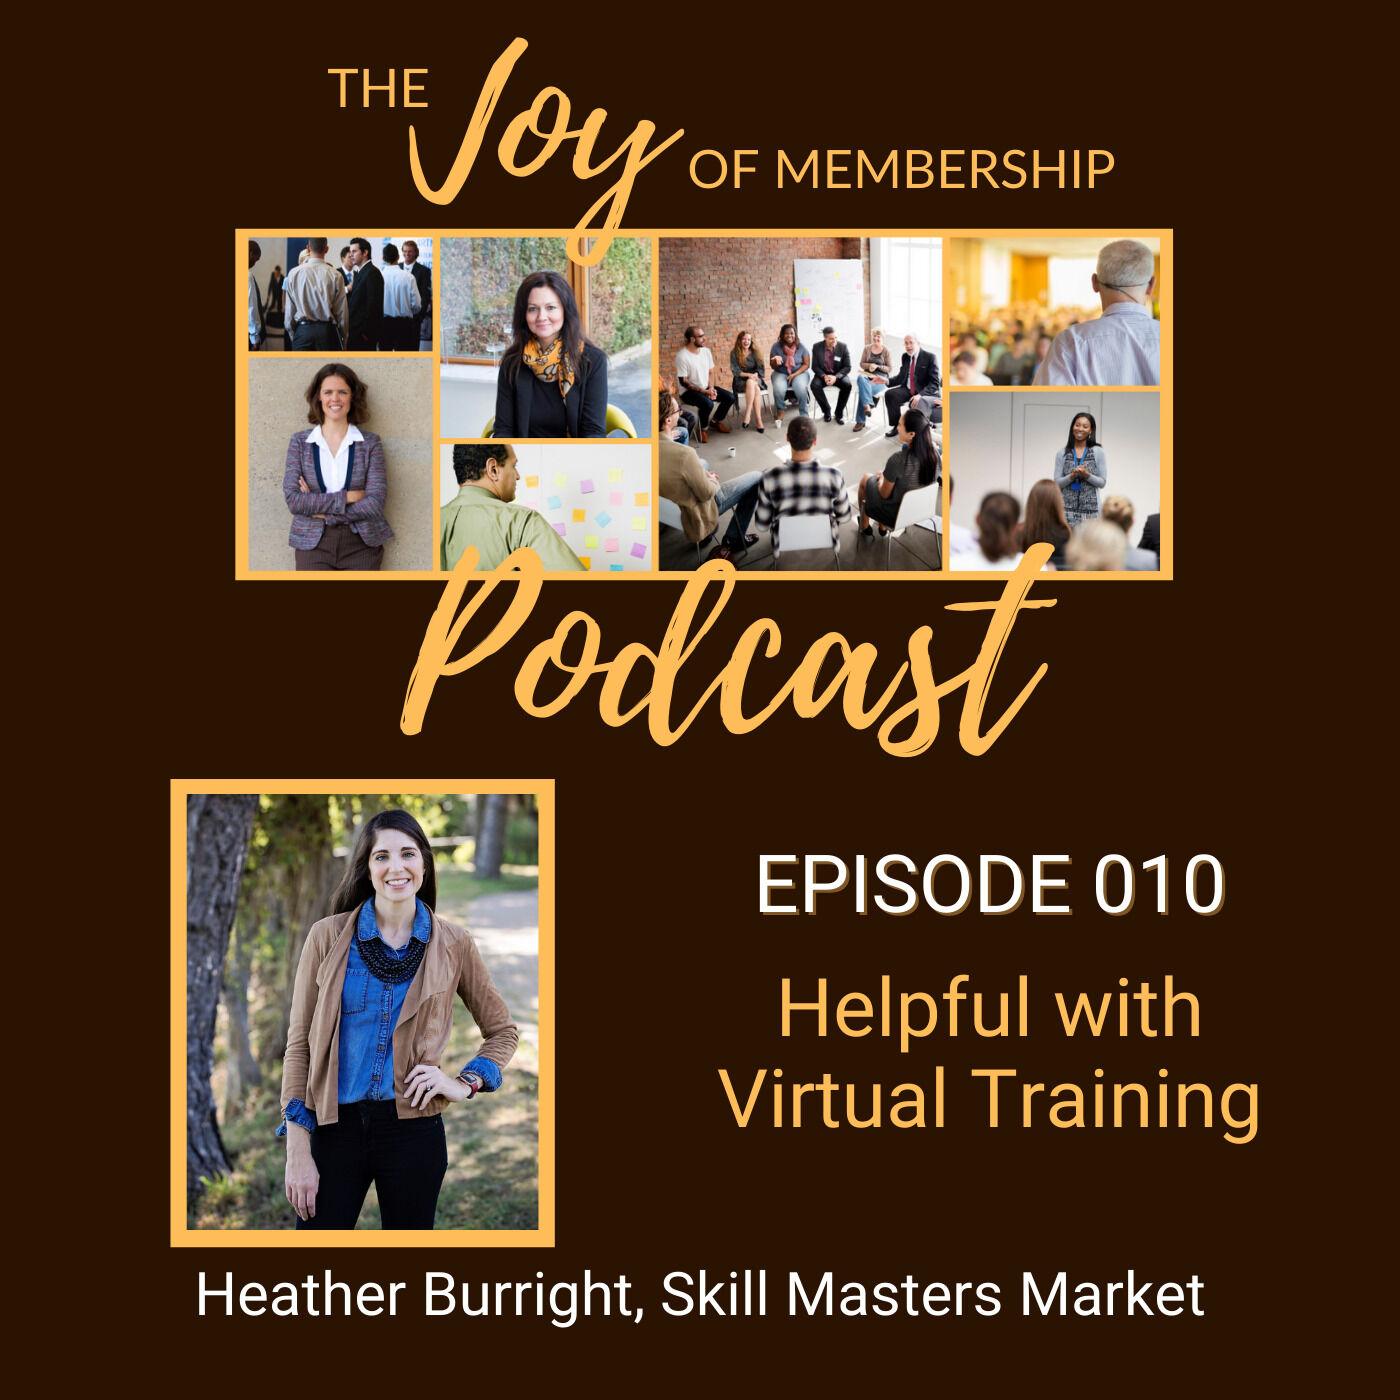 Helpful with Virtual Training: Heather Burright